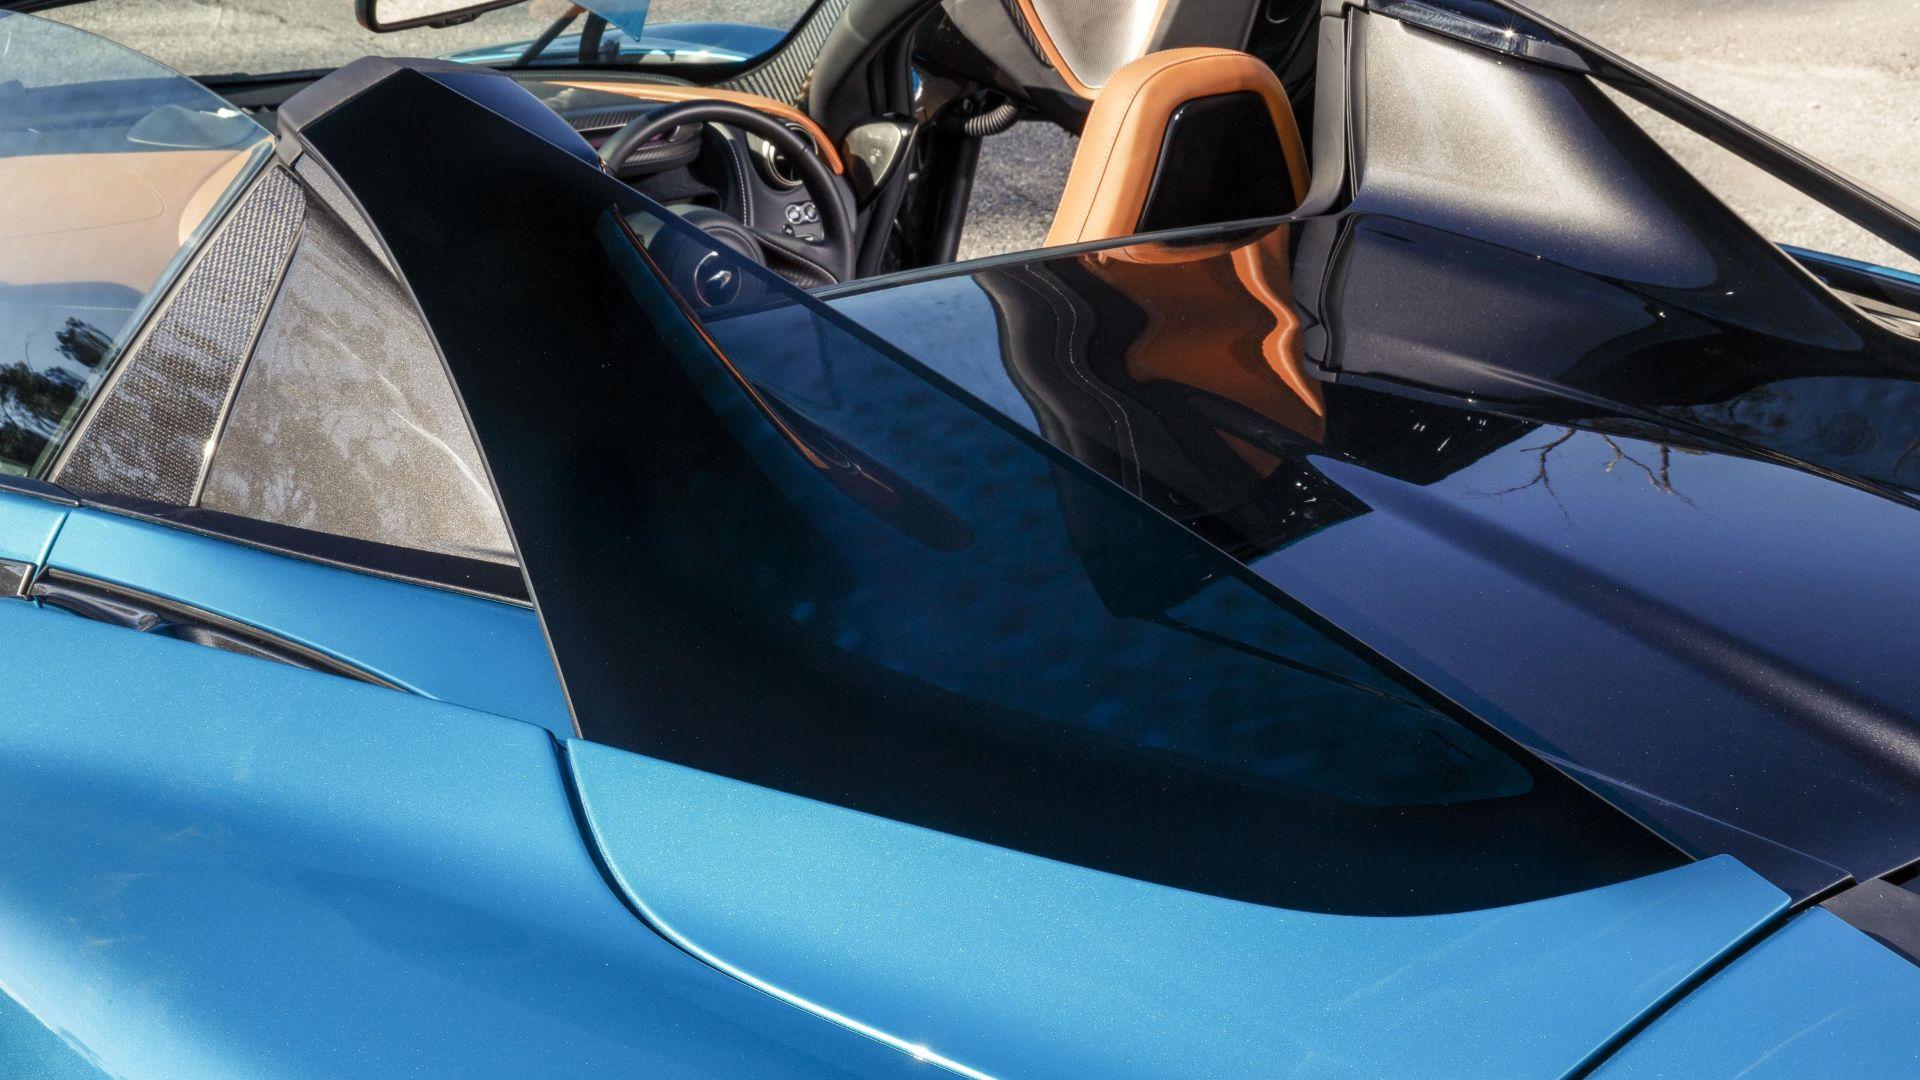 McLaren glass One Plus Concept One phone